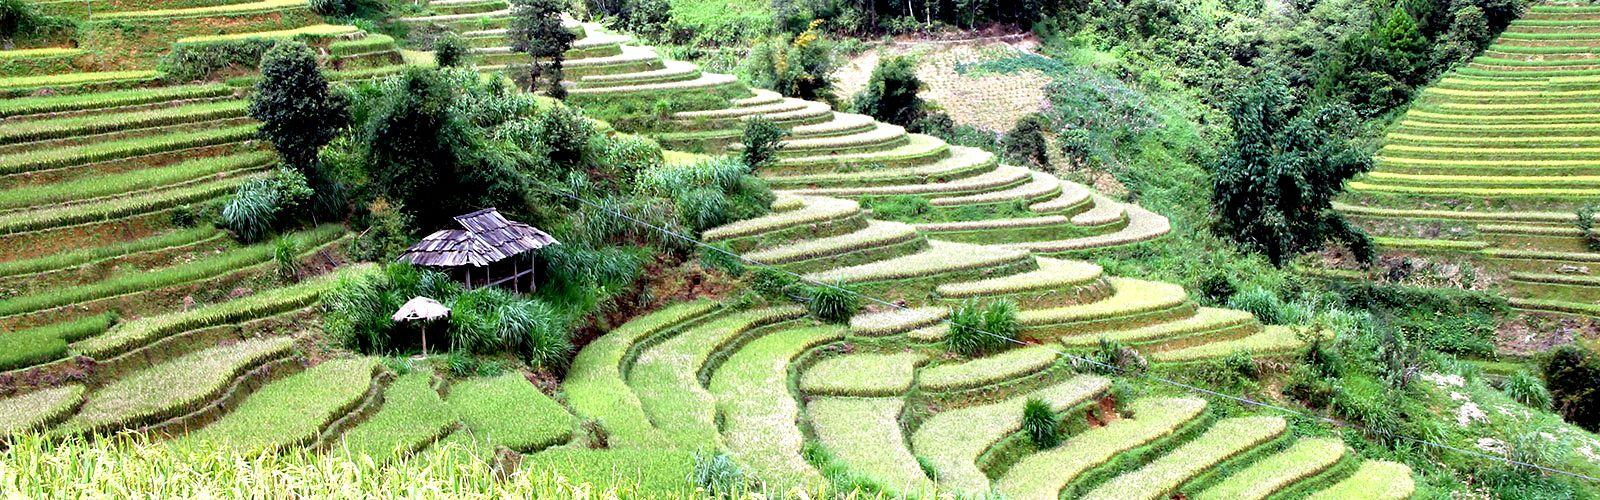 Rizières en terrasses du nord Vietnam © P. Girard, Cirad